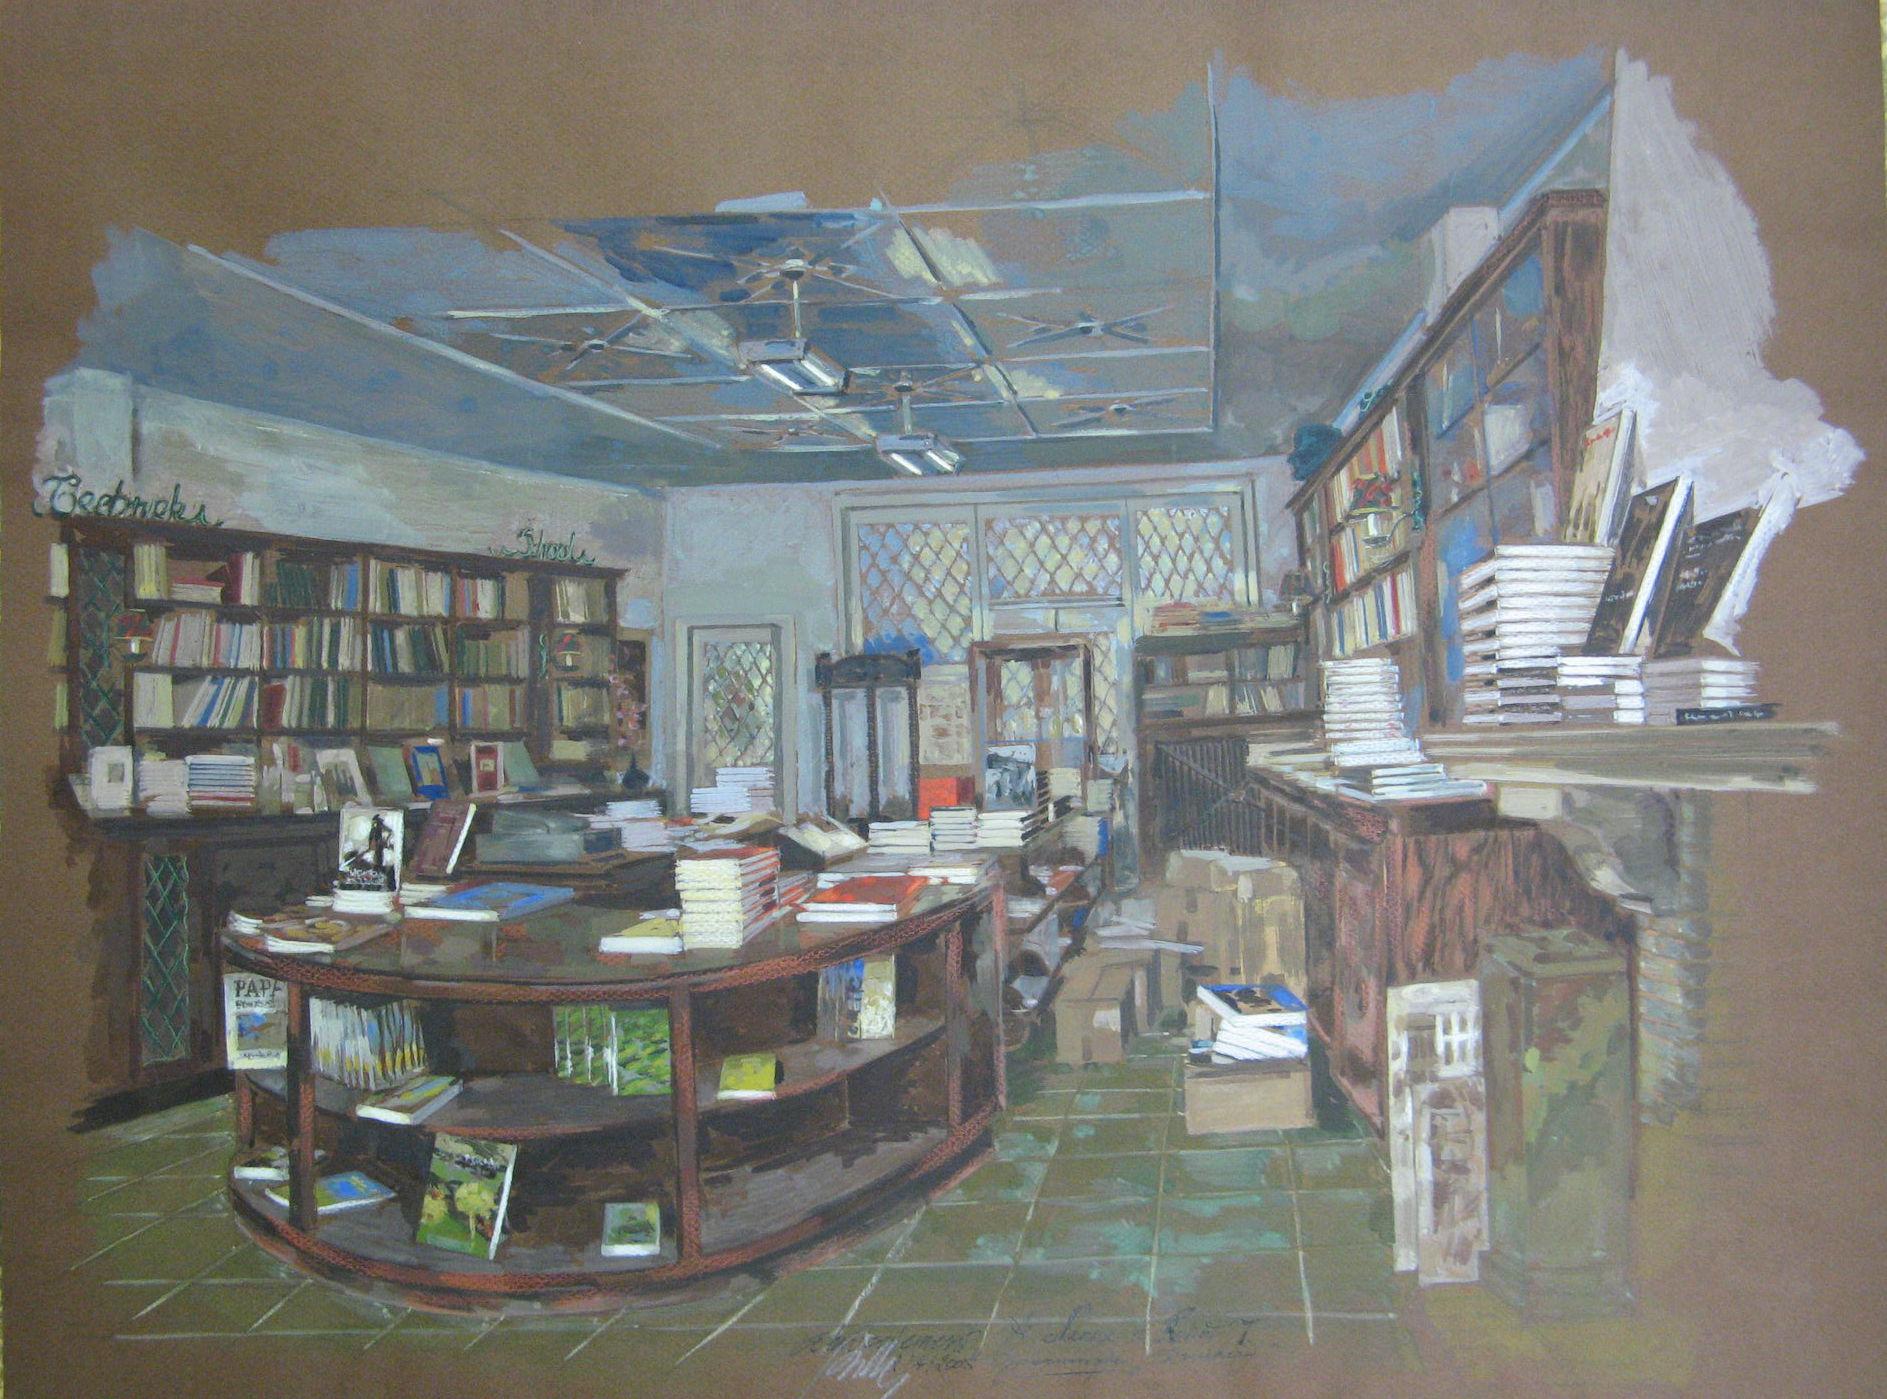 Boekhandel Groeninghe